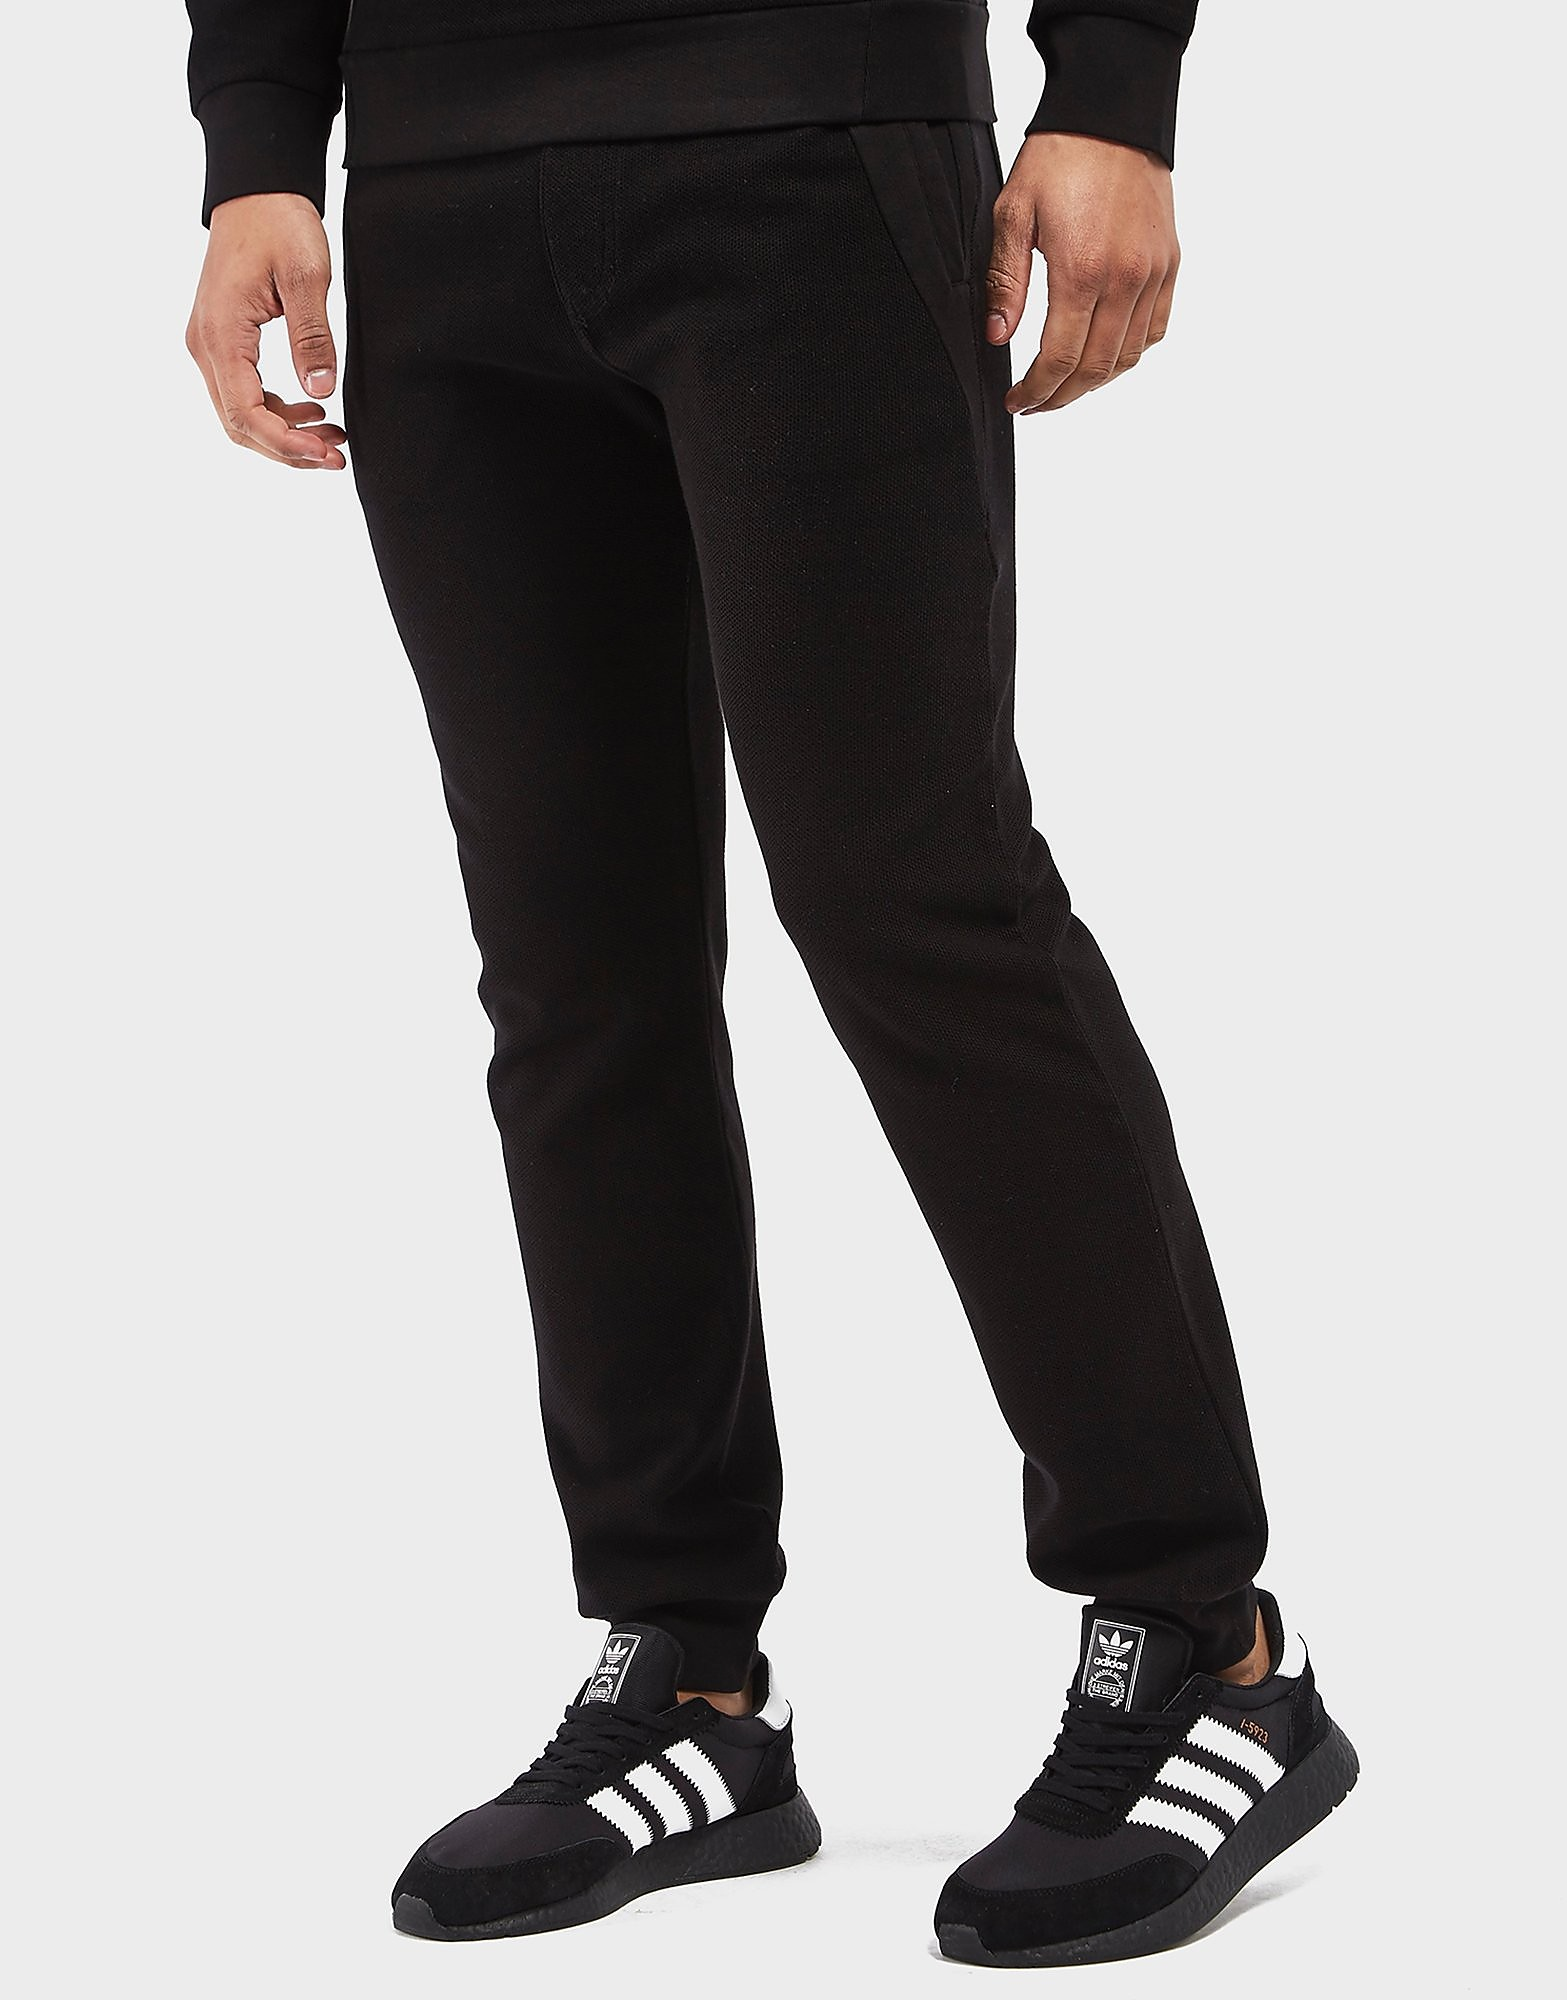 Pyrenex Alban Fleece Cuffed Track Pants